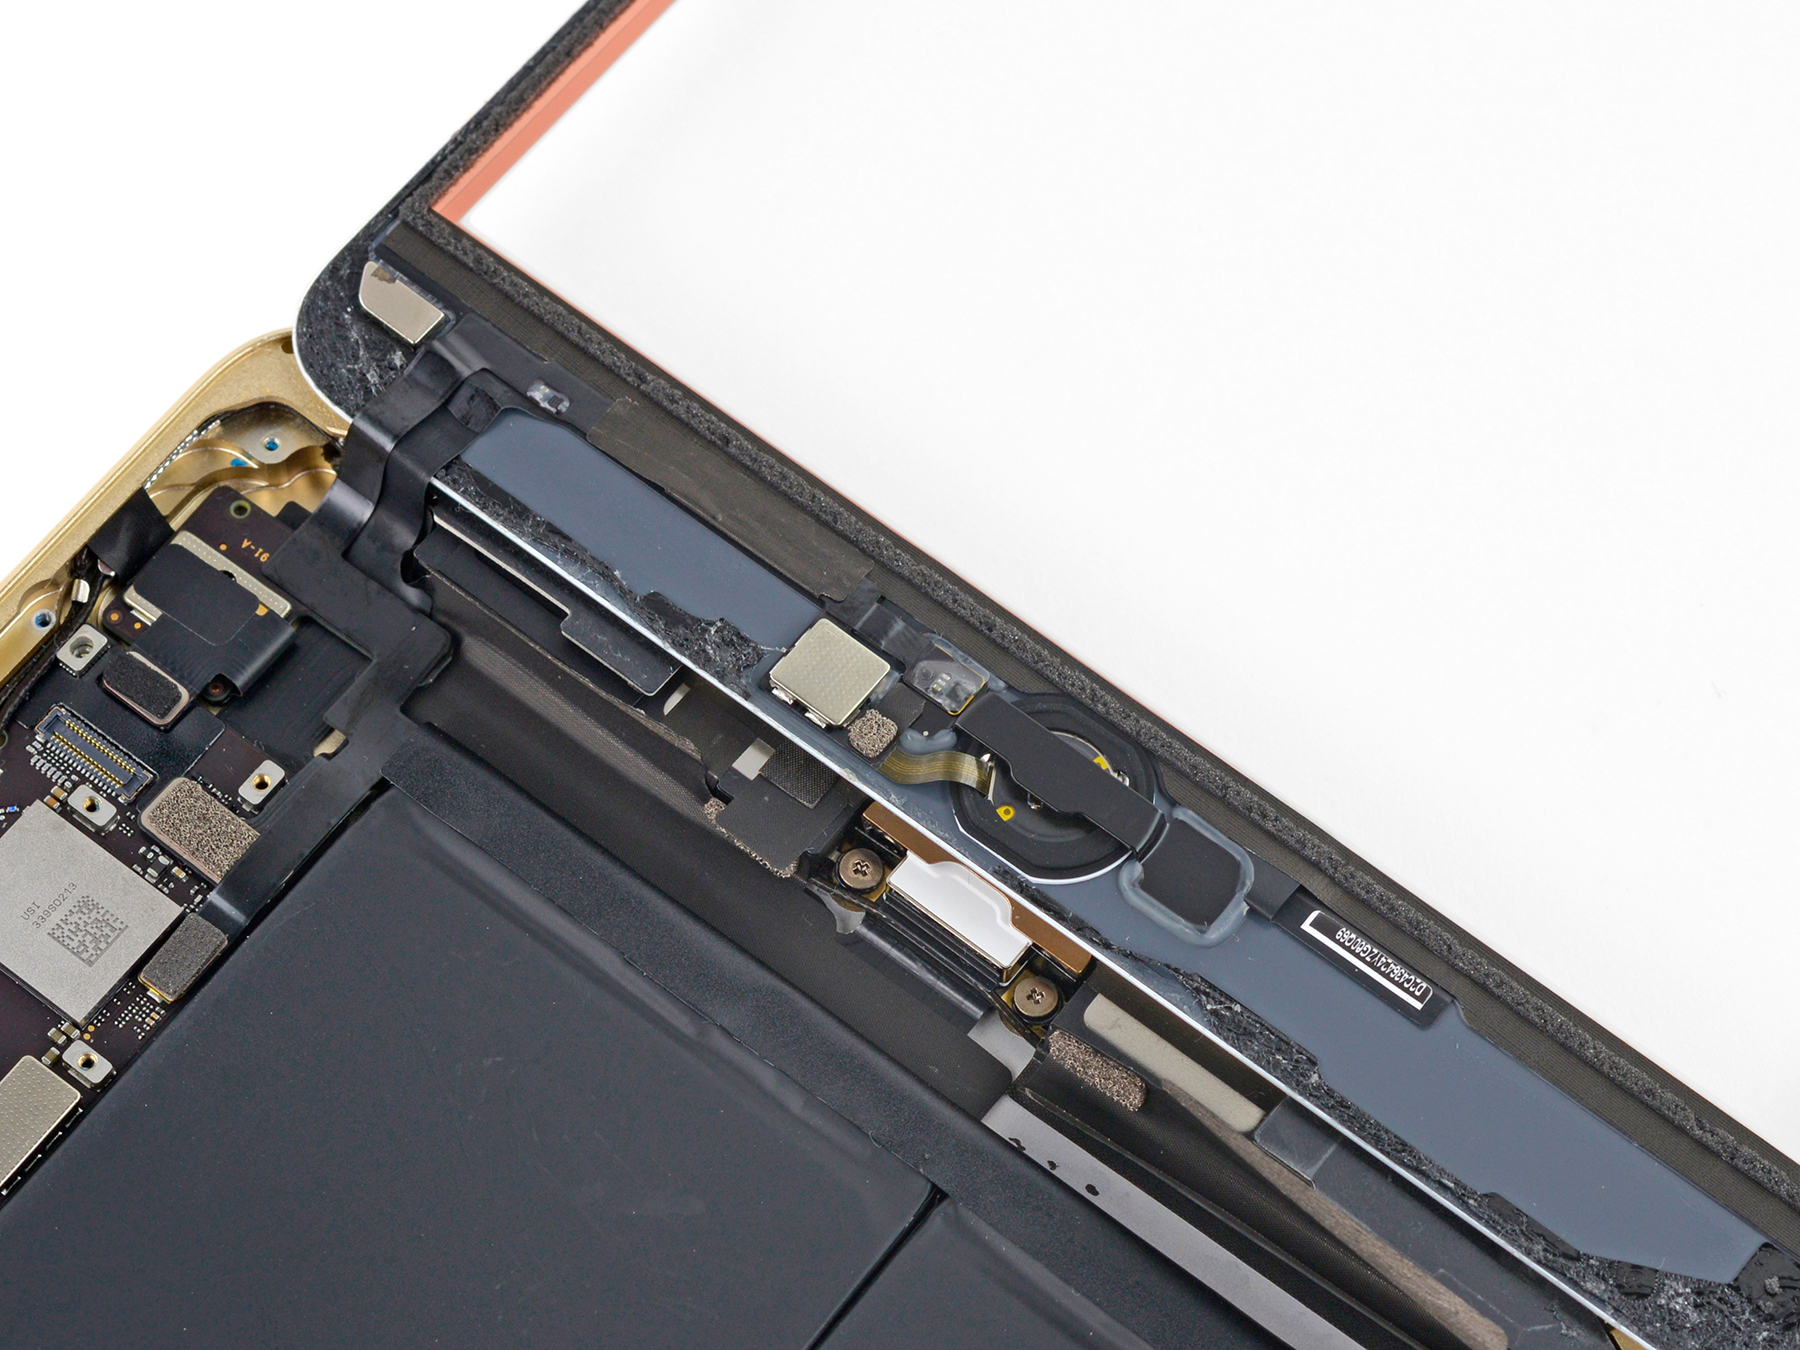 iPad mini 3 desmontado pela iFixit